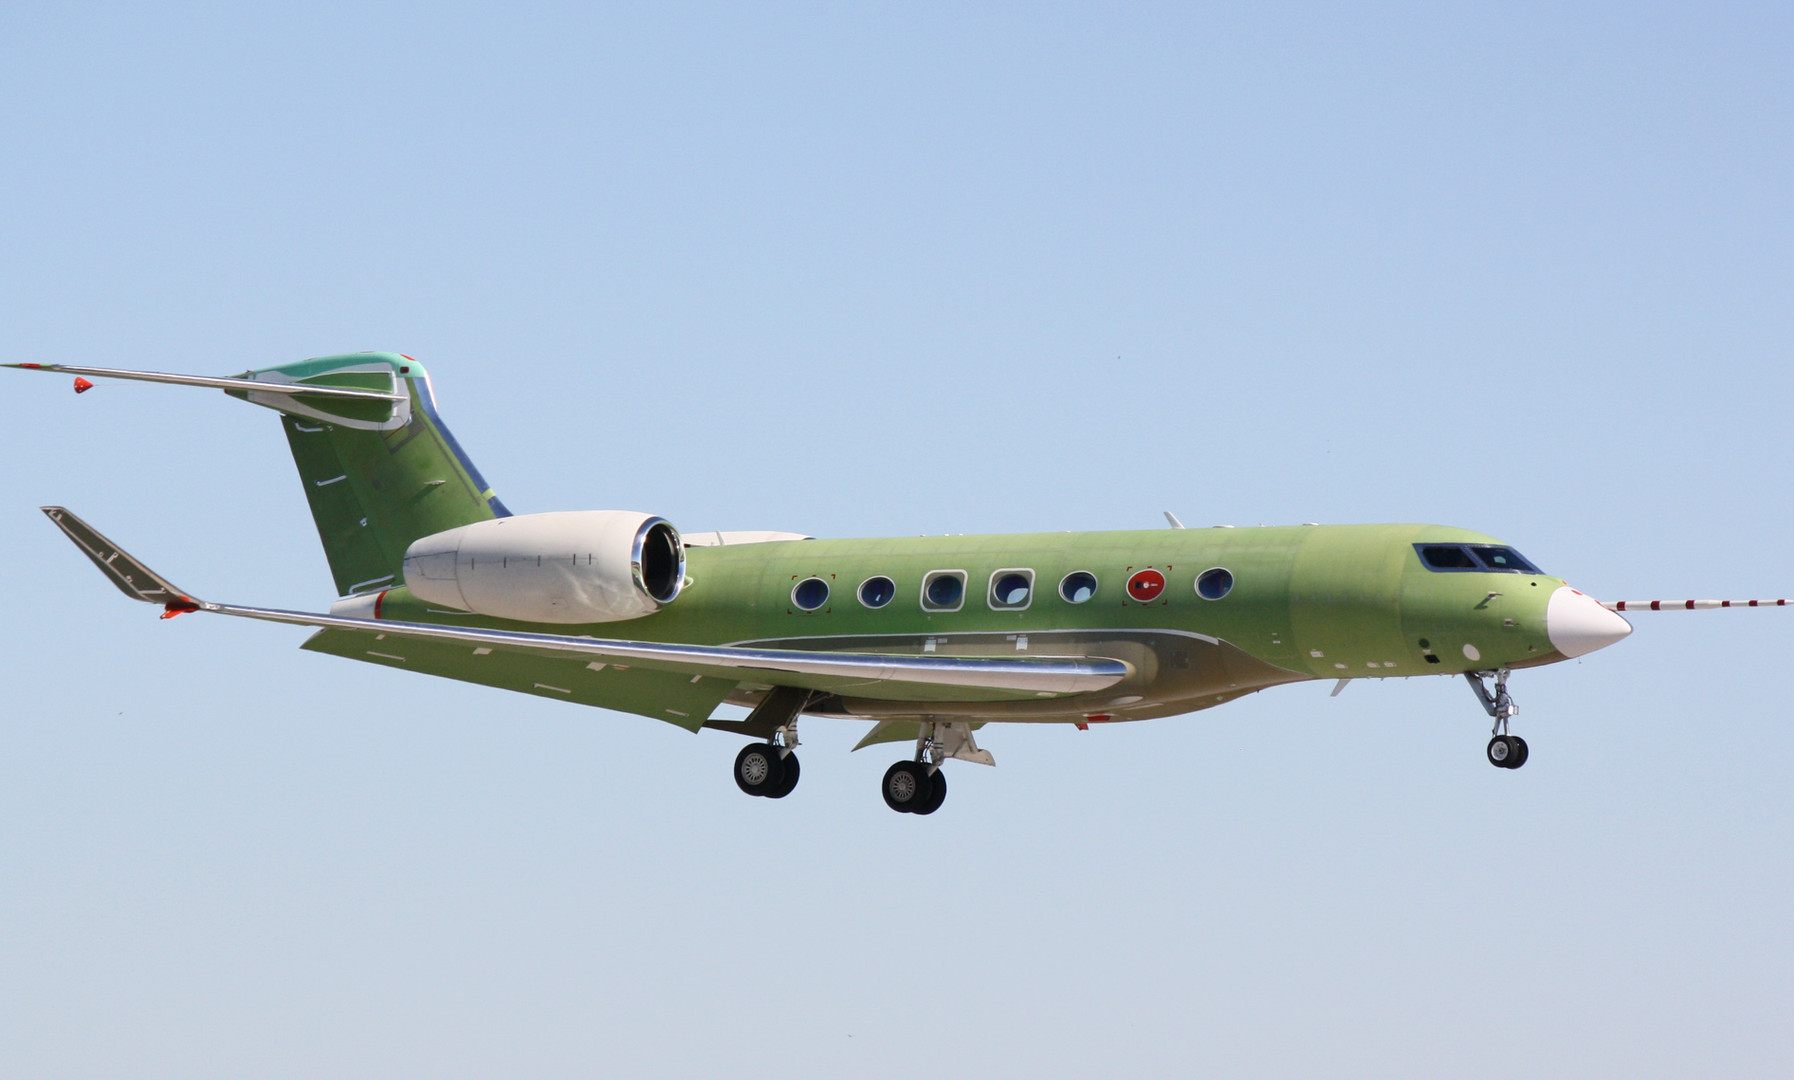 flighttest1 (1).jpg